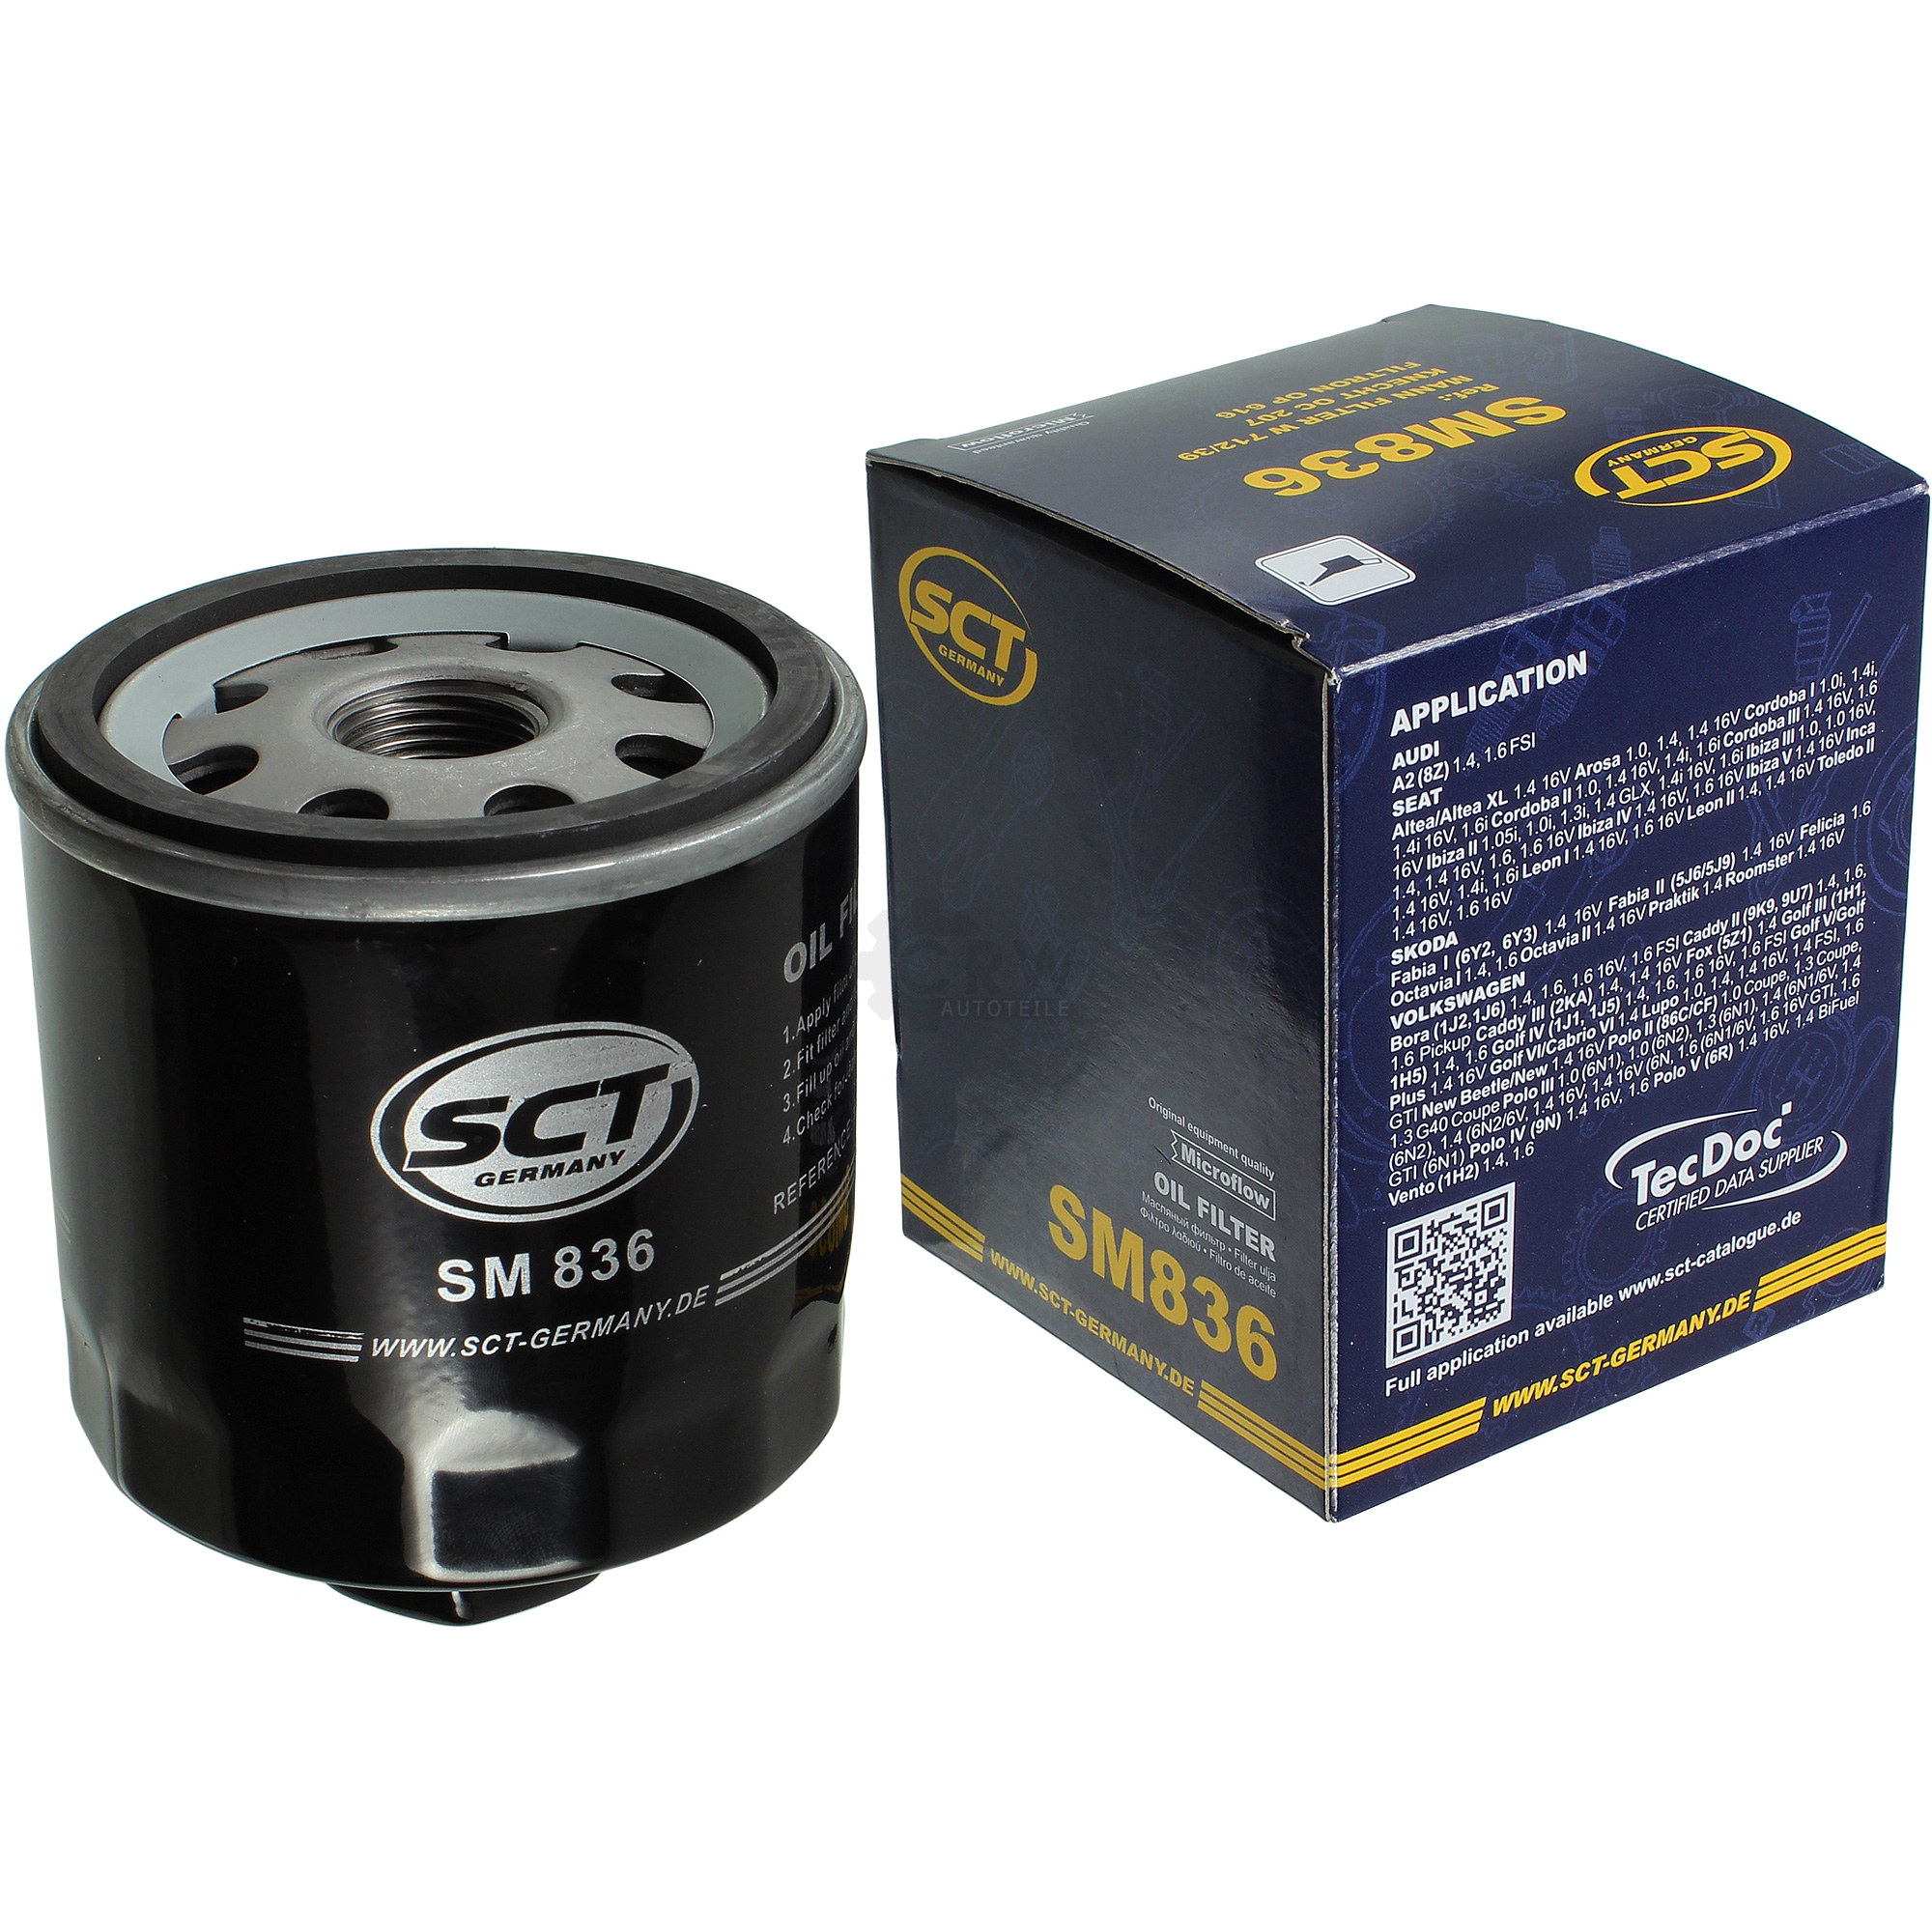 Olwechsel-Set-5L-MANNOL-Energy-Premium-5W-30-Motoroel-SCT-Filter-KIT-10138577 Indexbild 4